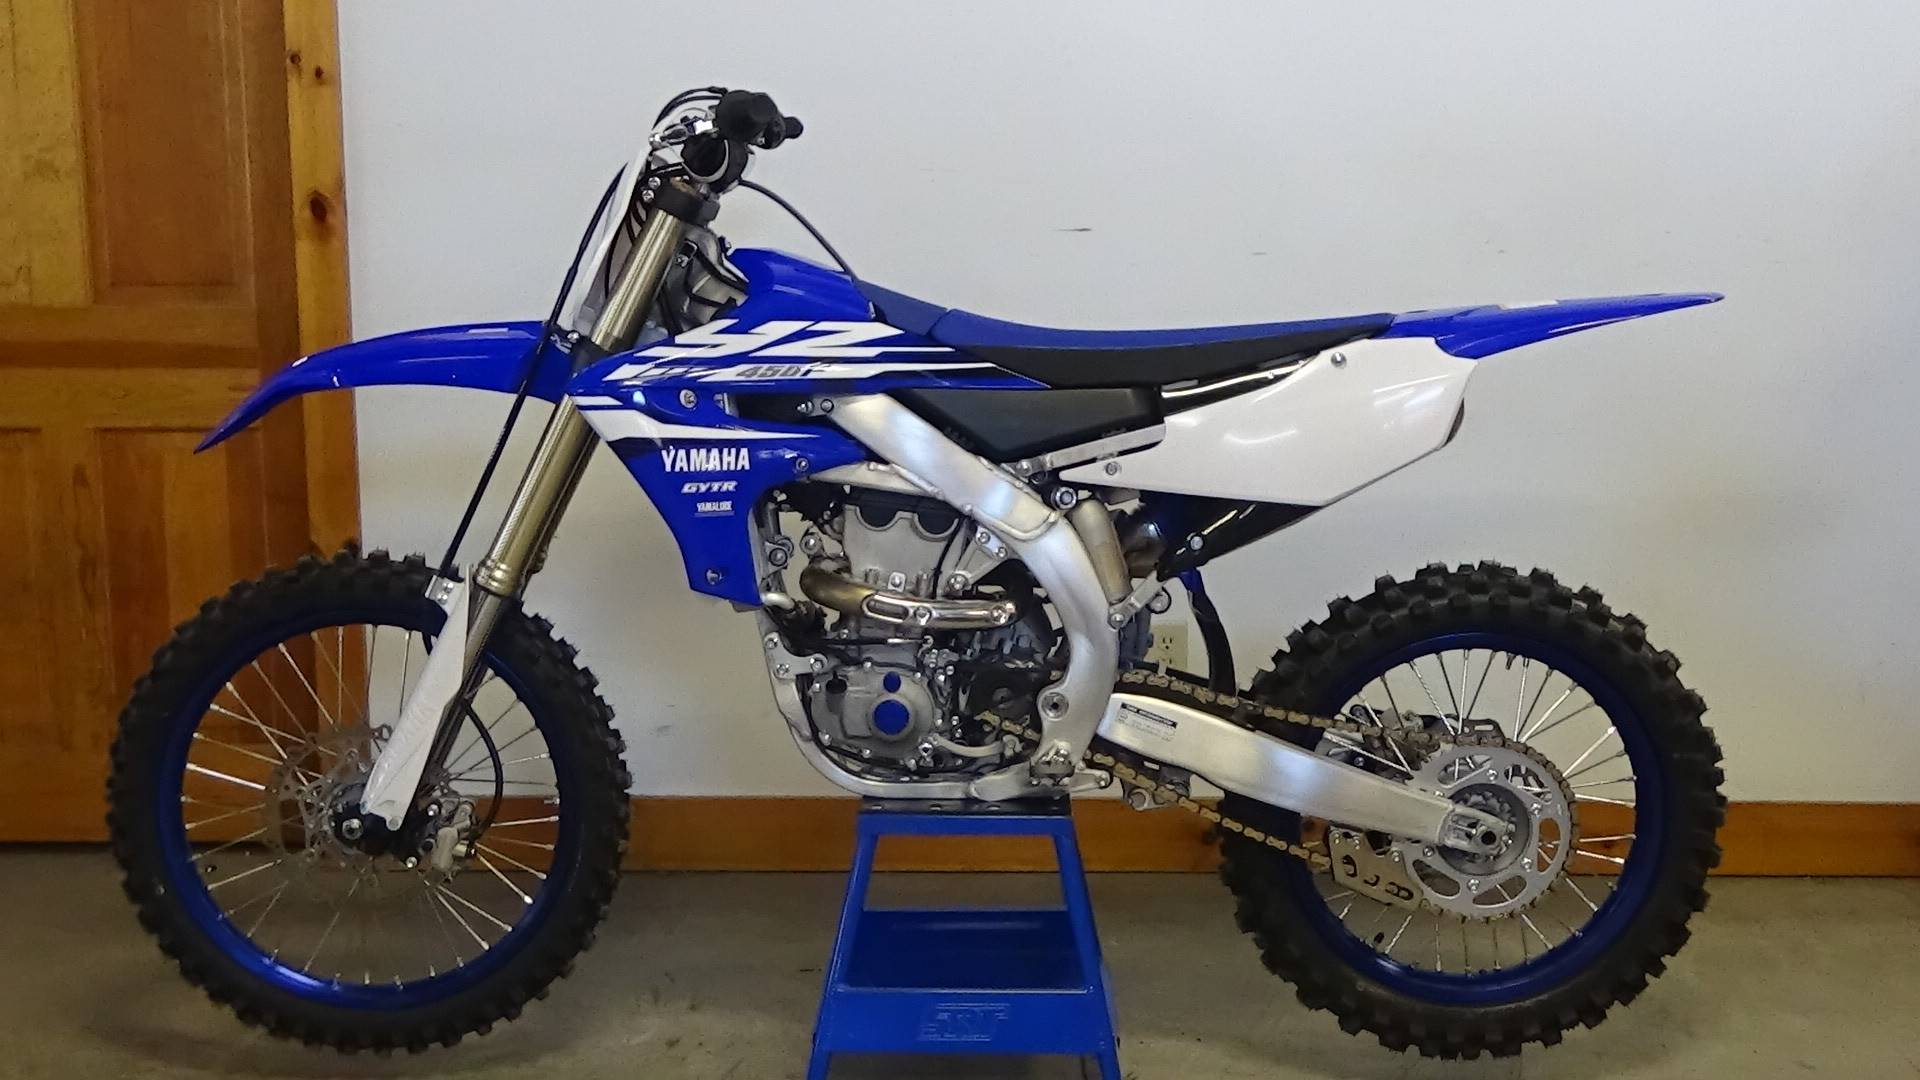 2019 Yamaha YZ450F for sale 10605